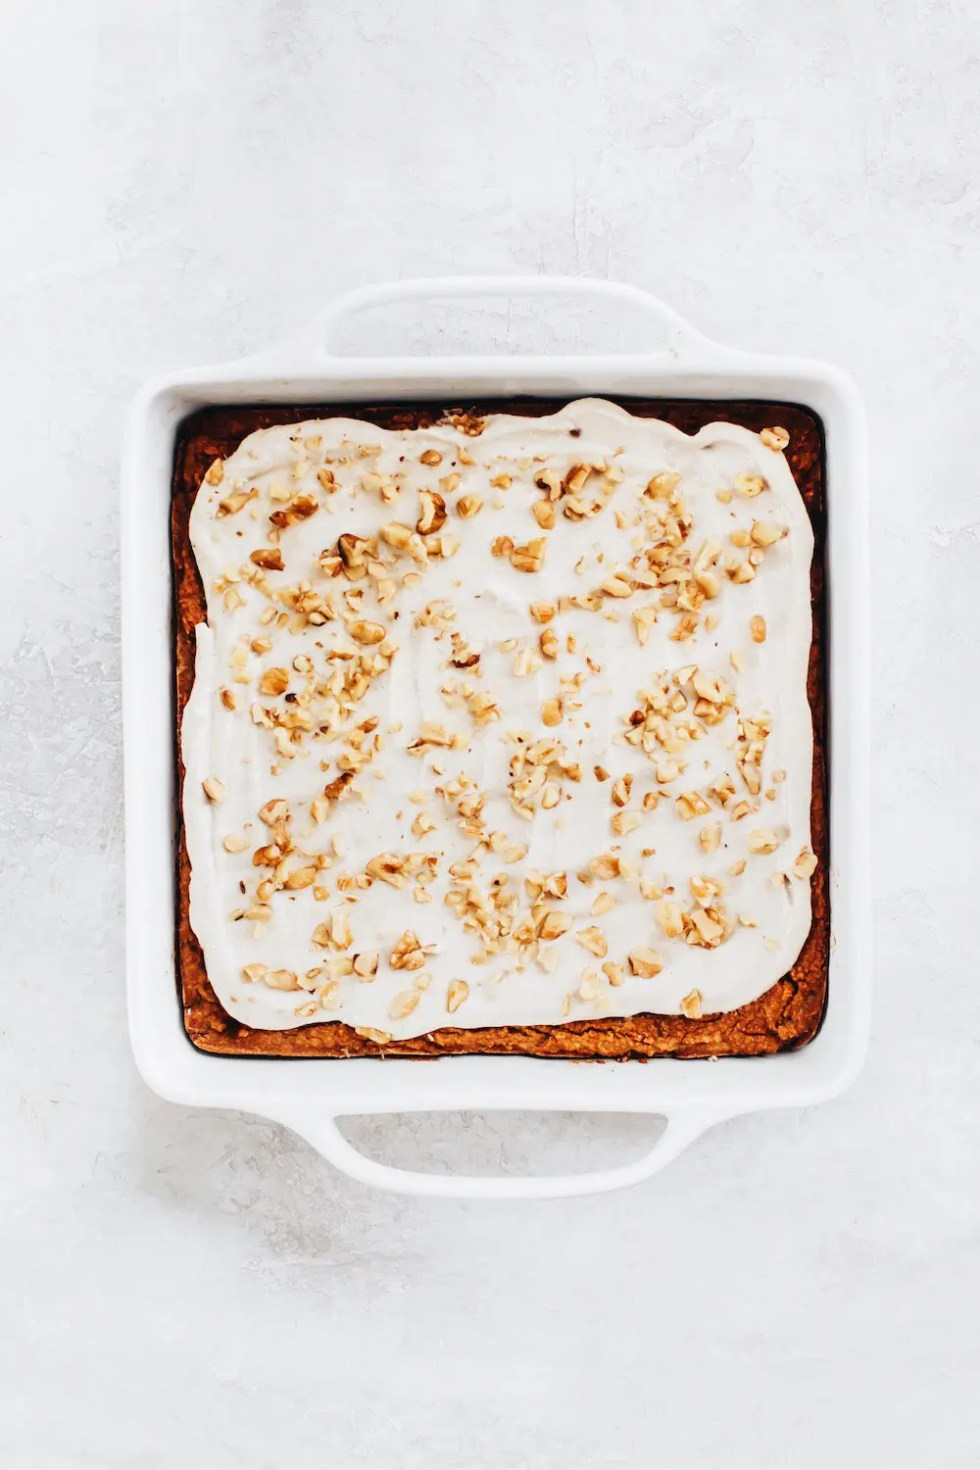 Vegan gluten free carrot cake cashew yogurt frosting feasting on vegan gluten free carrot cake forumfinder Images